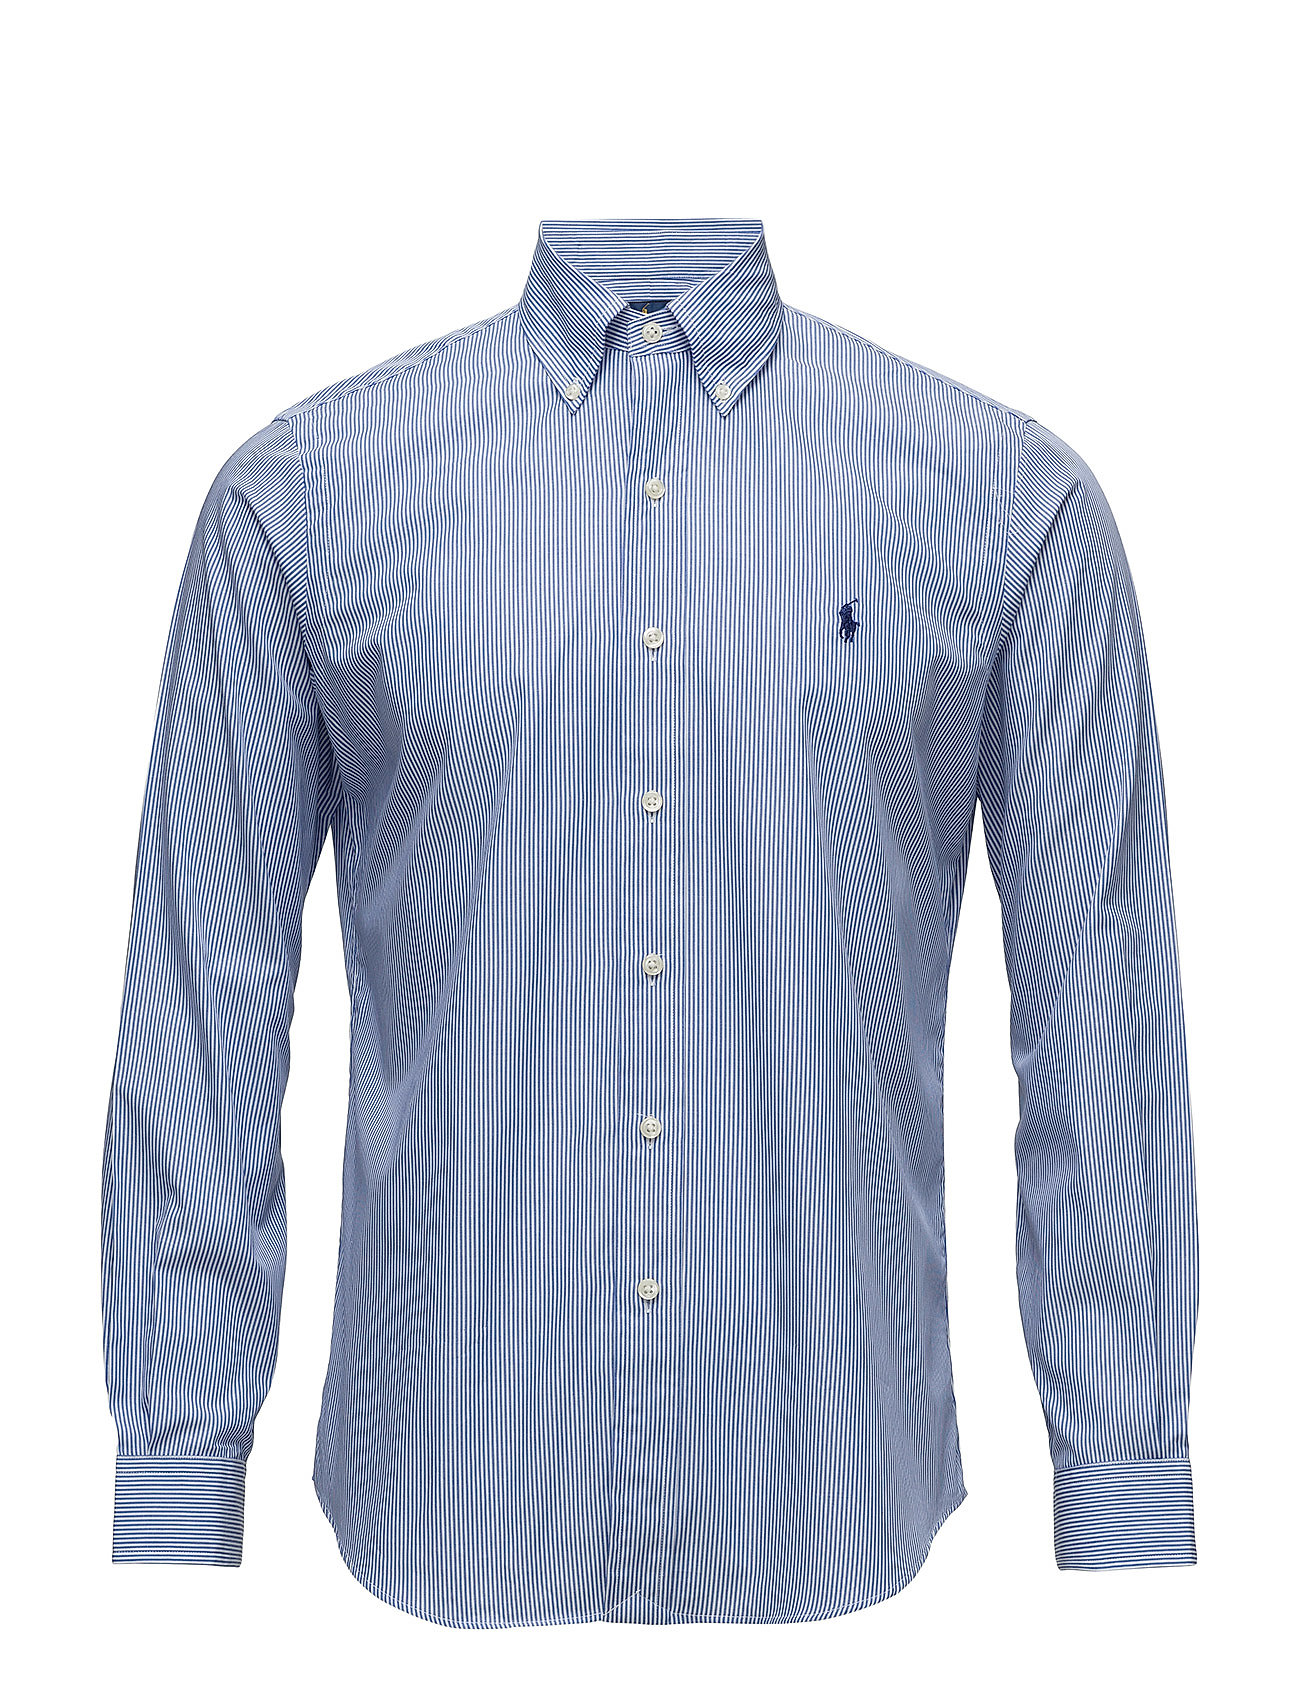 Polo Ralph Lauren BD PPC SPT-LONG SLEEVE-SPORT SHIRT - 2866 BLUE/WHITE H